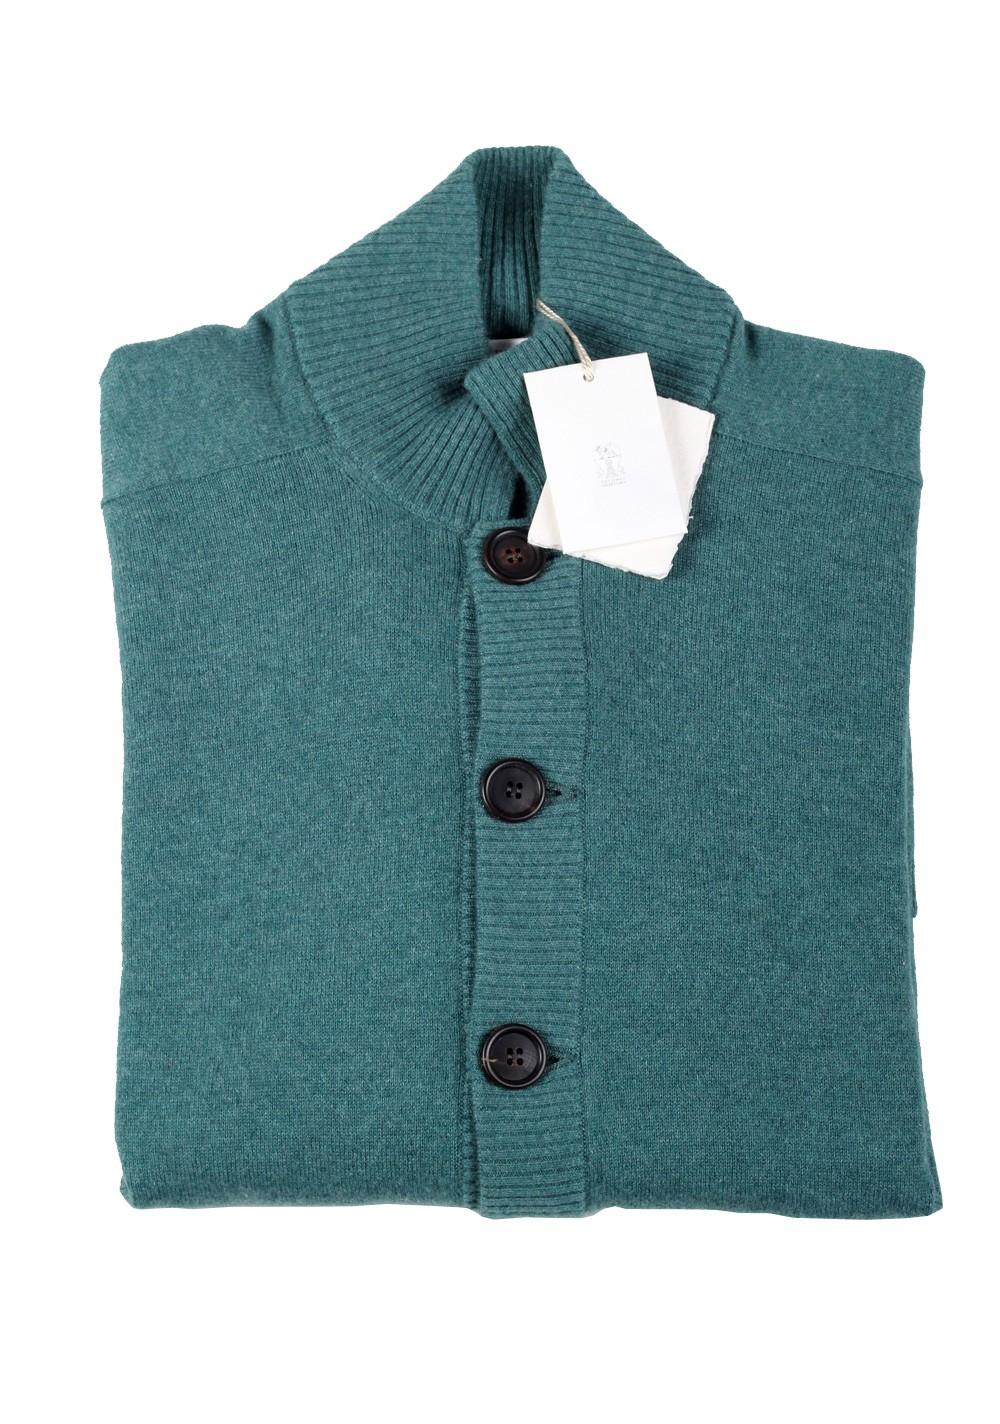 Cucinelli Cardigan Size 58 / 48R U.S. Green 100% Cashmere | Costume Limité